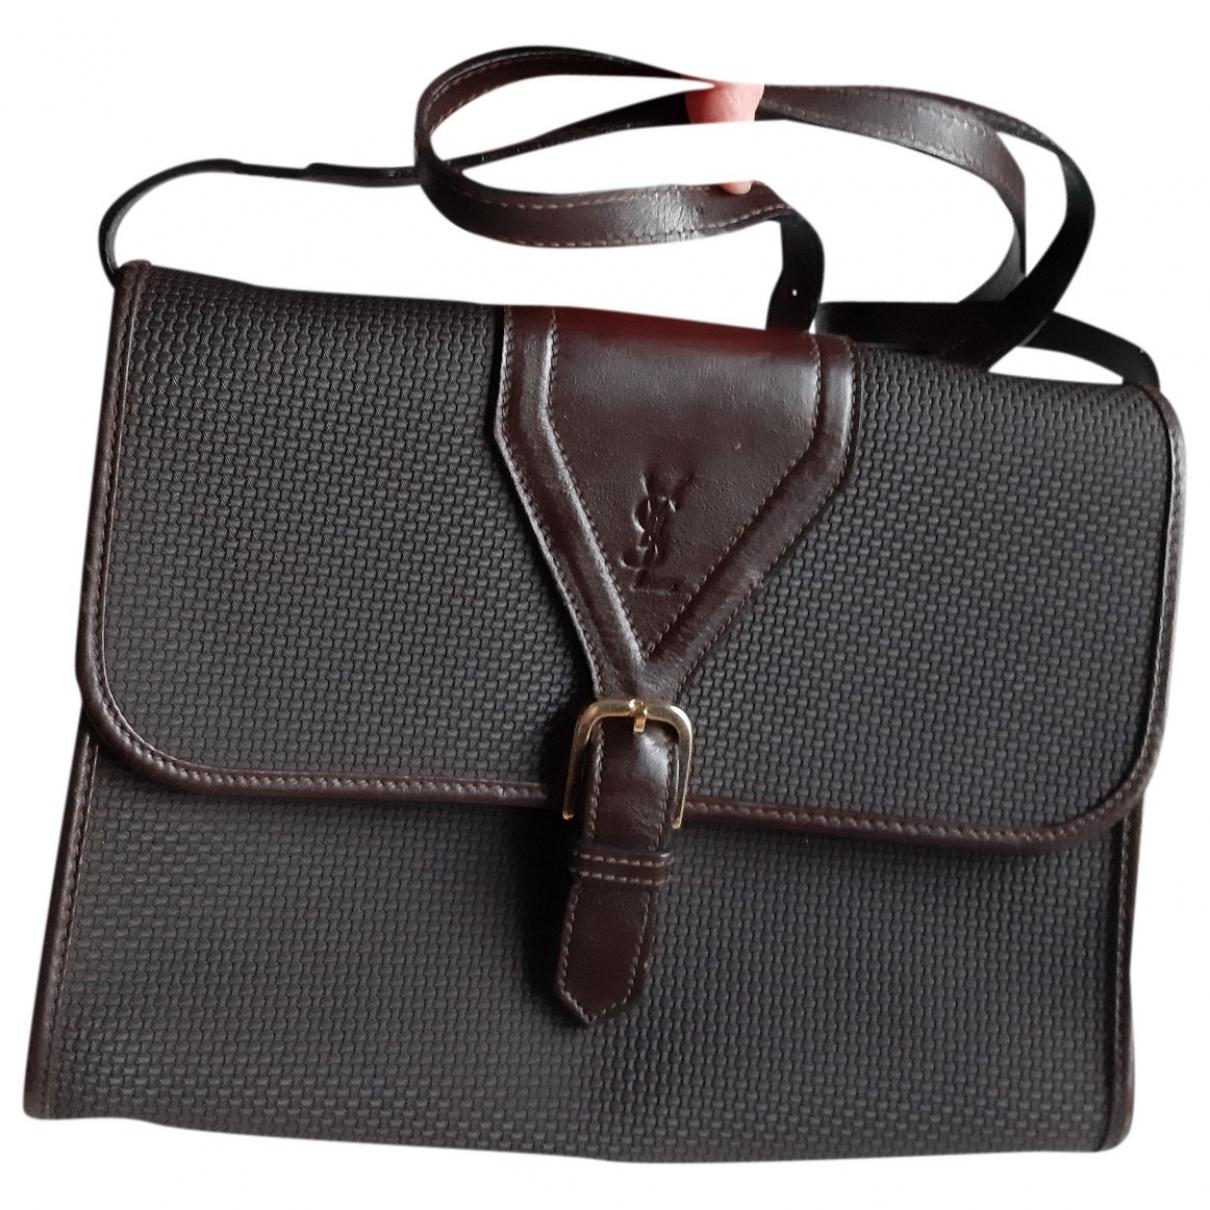 Yves Saint Laurent \N Brown handbag for Women \N